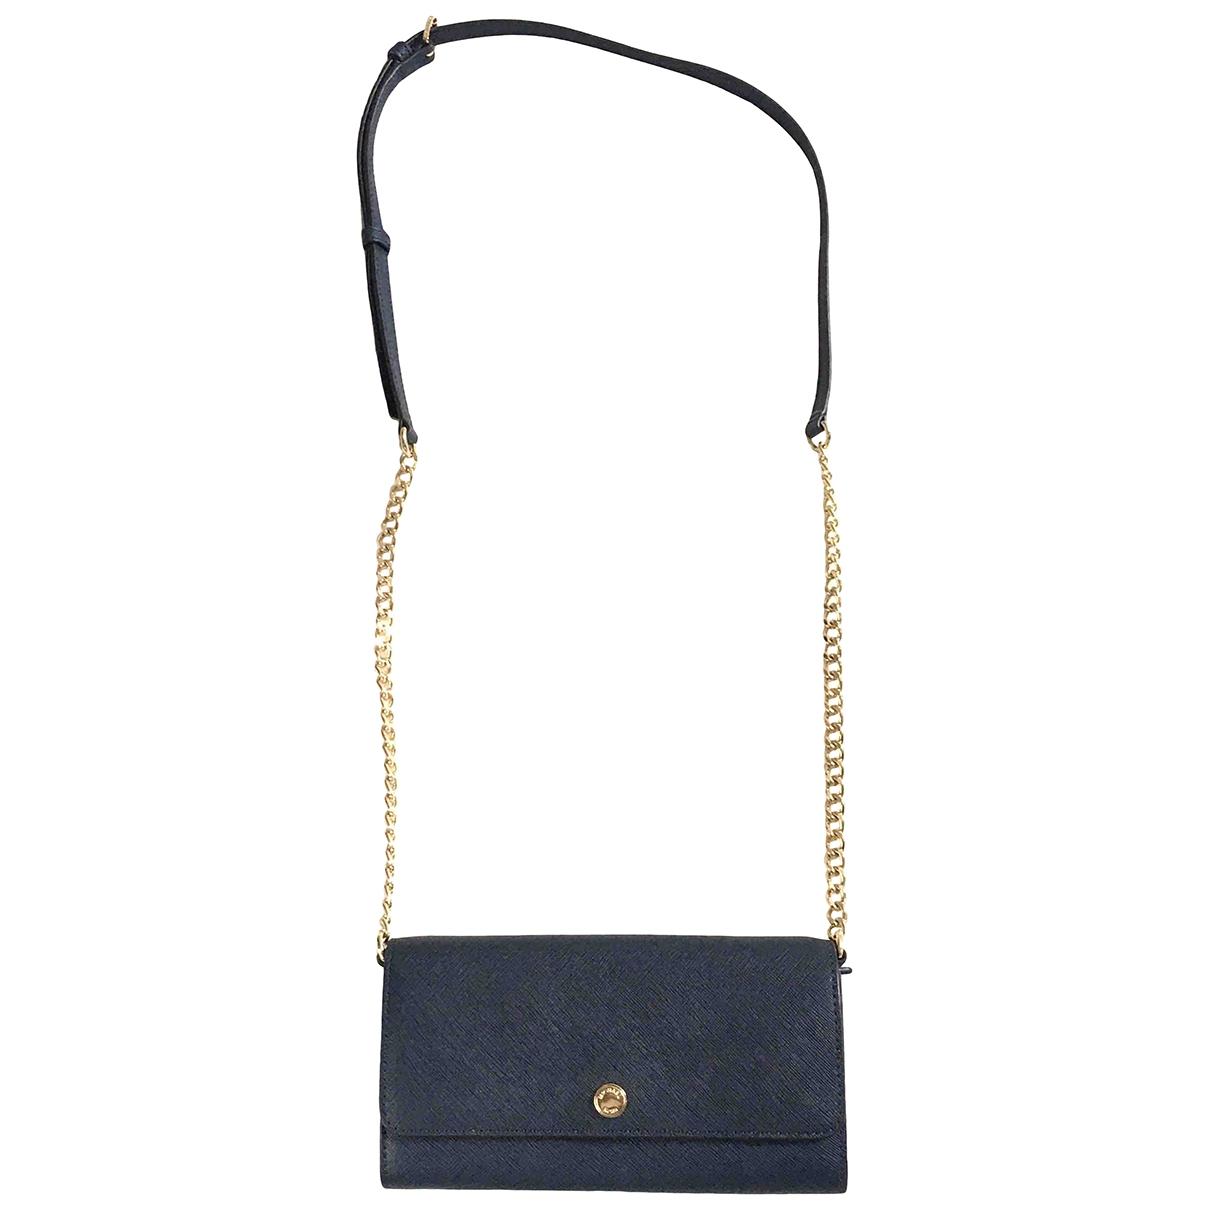 Michael Kors \N Navy Leather Clutch bag for Women \N